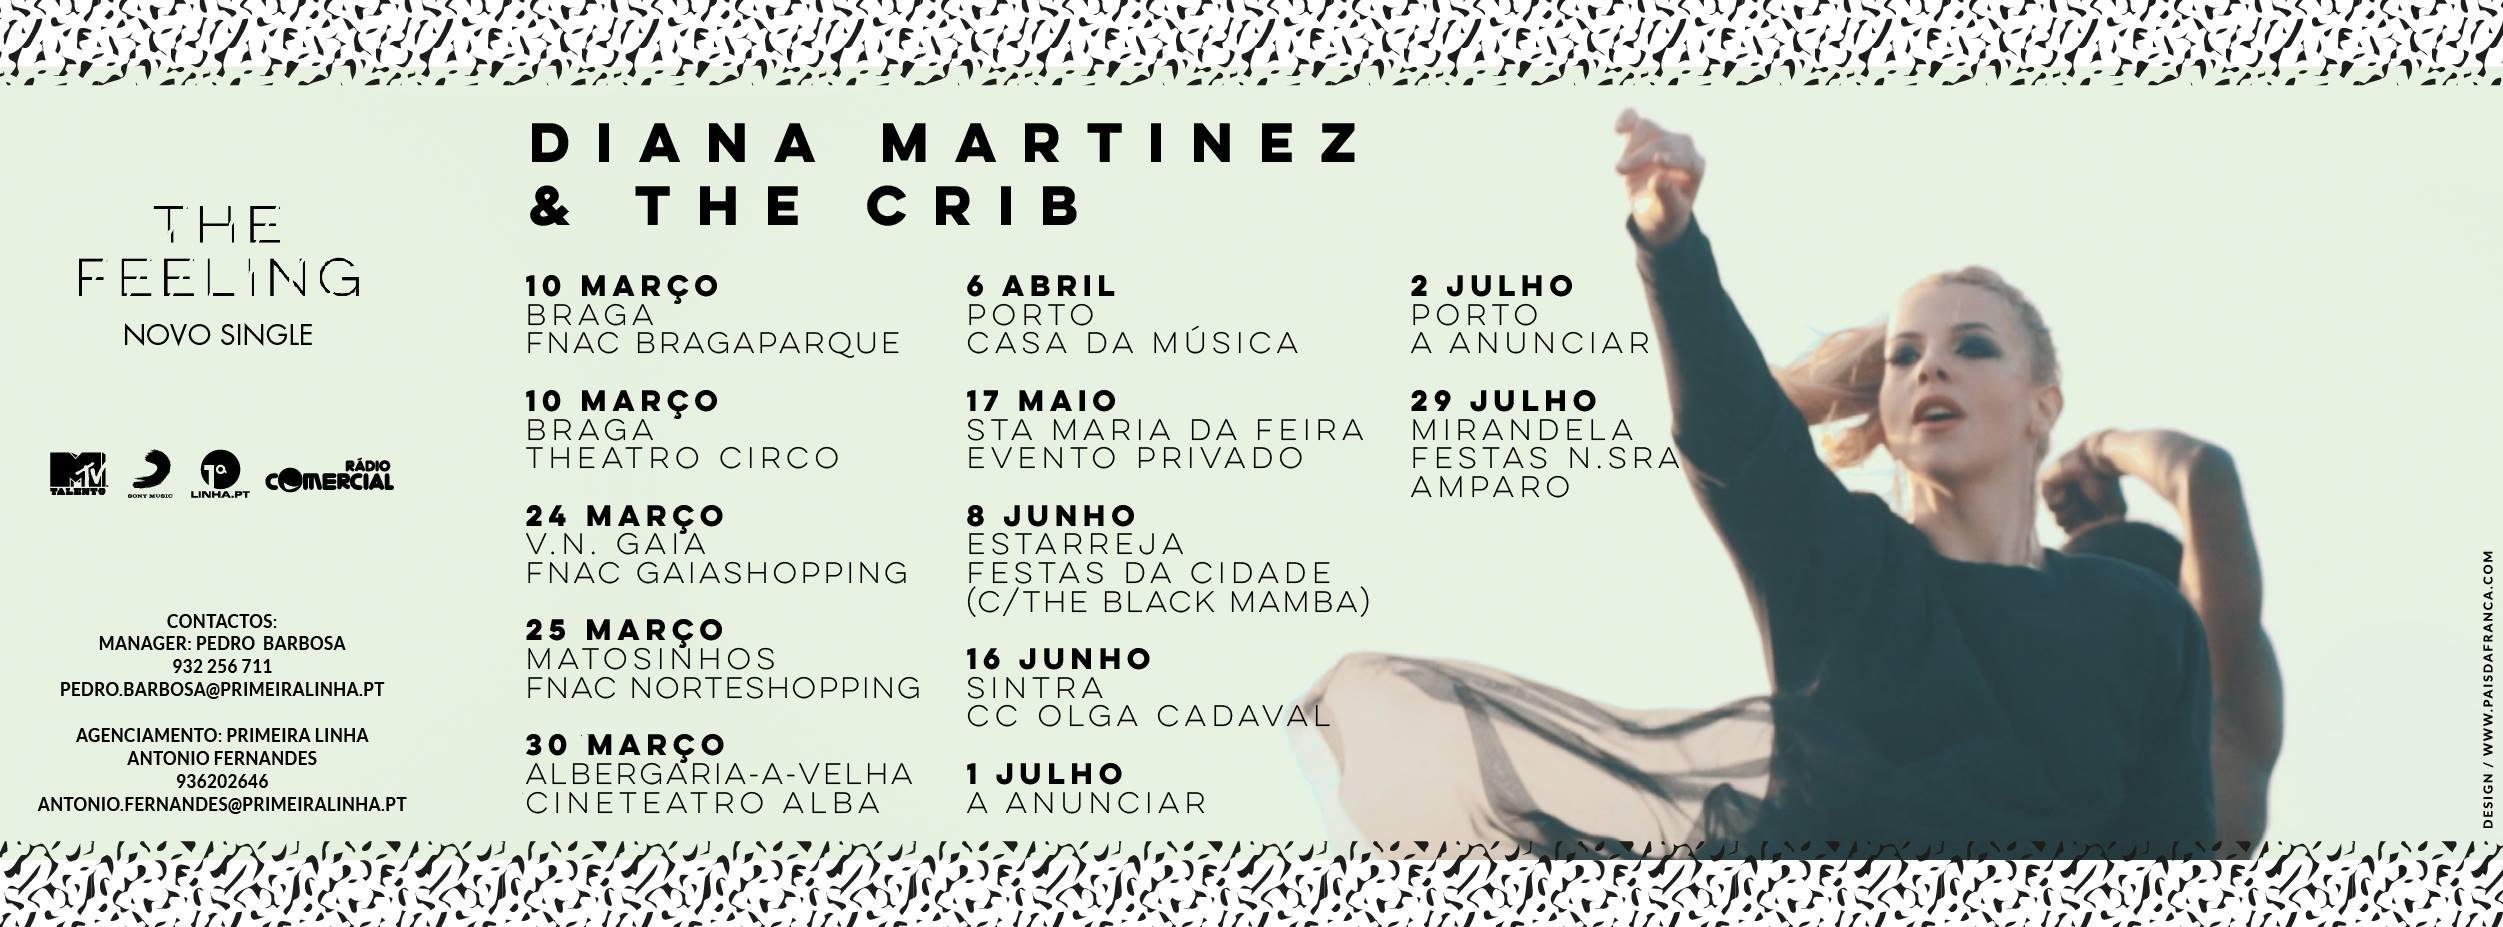 AGENDA - Diana Martinez & The Crib